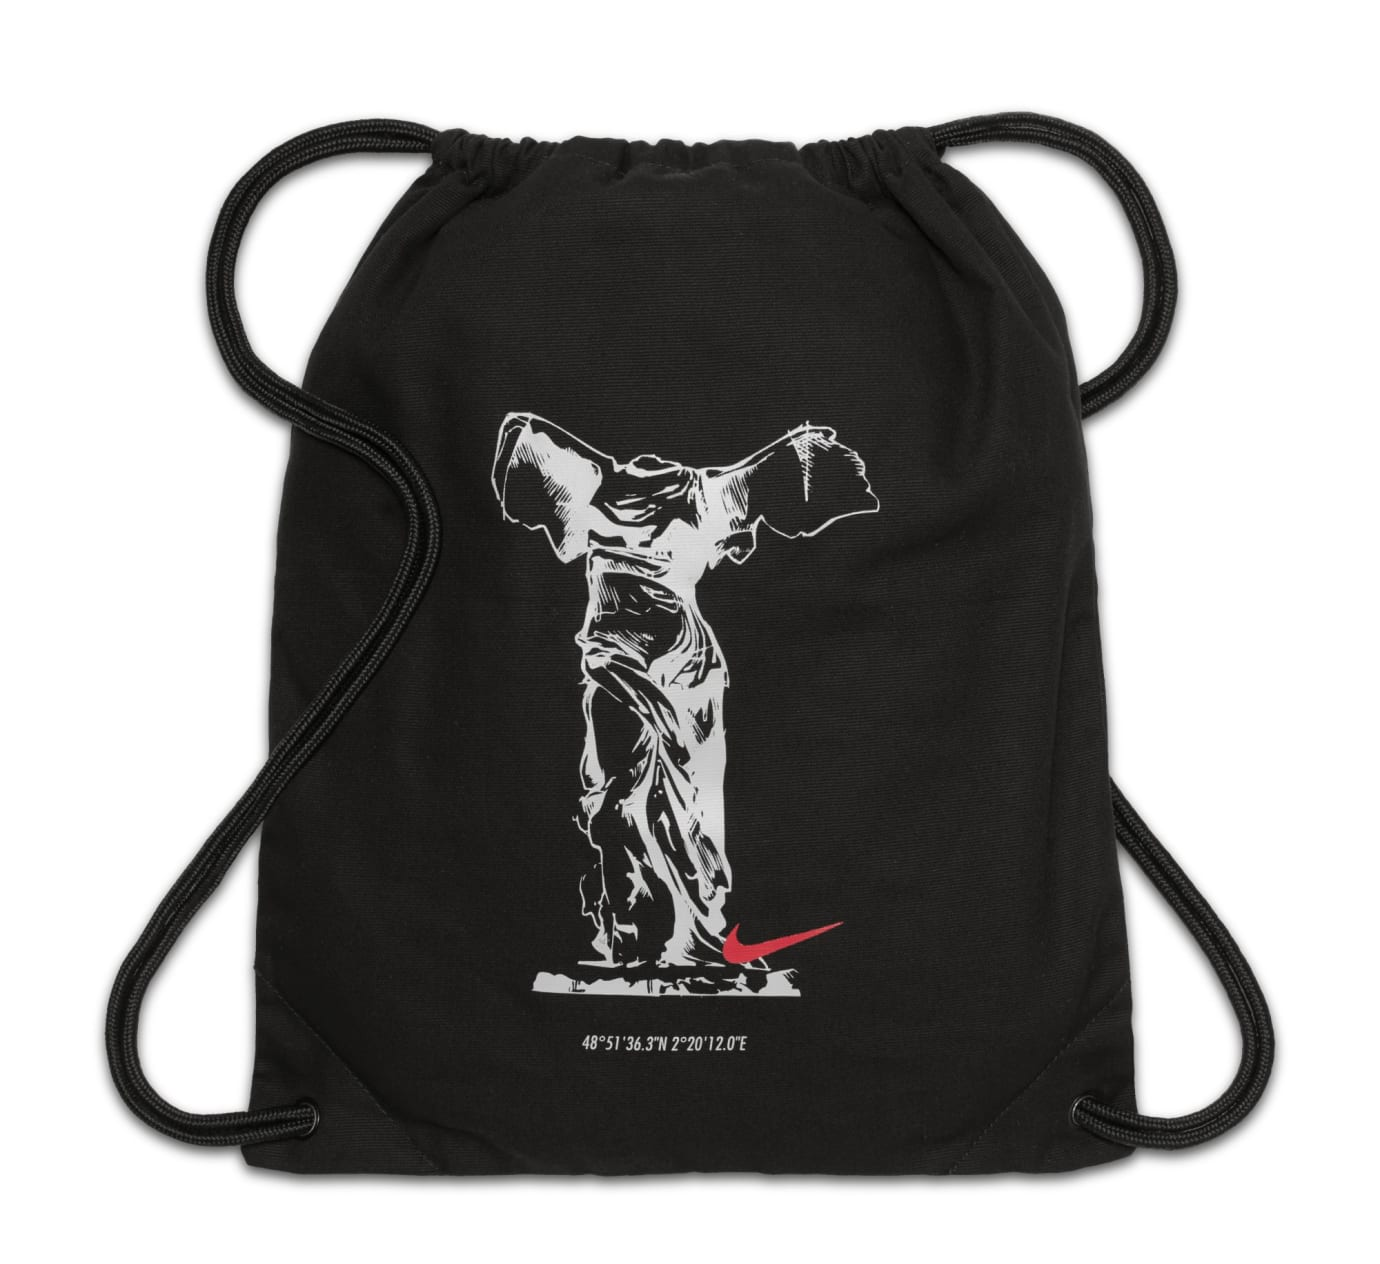 Nike Moon Racer 'Black/White/Wolf Grey' AQ4121-001 (Dust Bag)